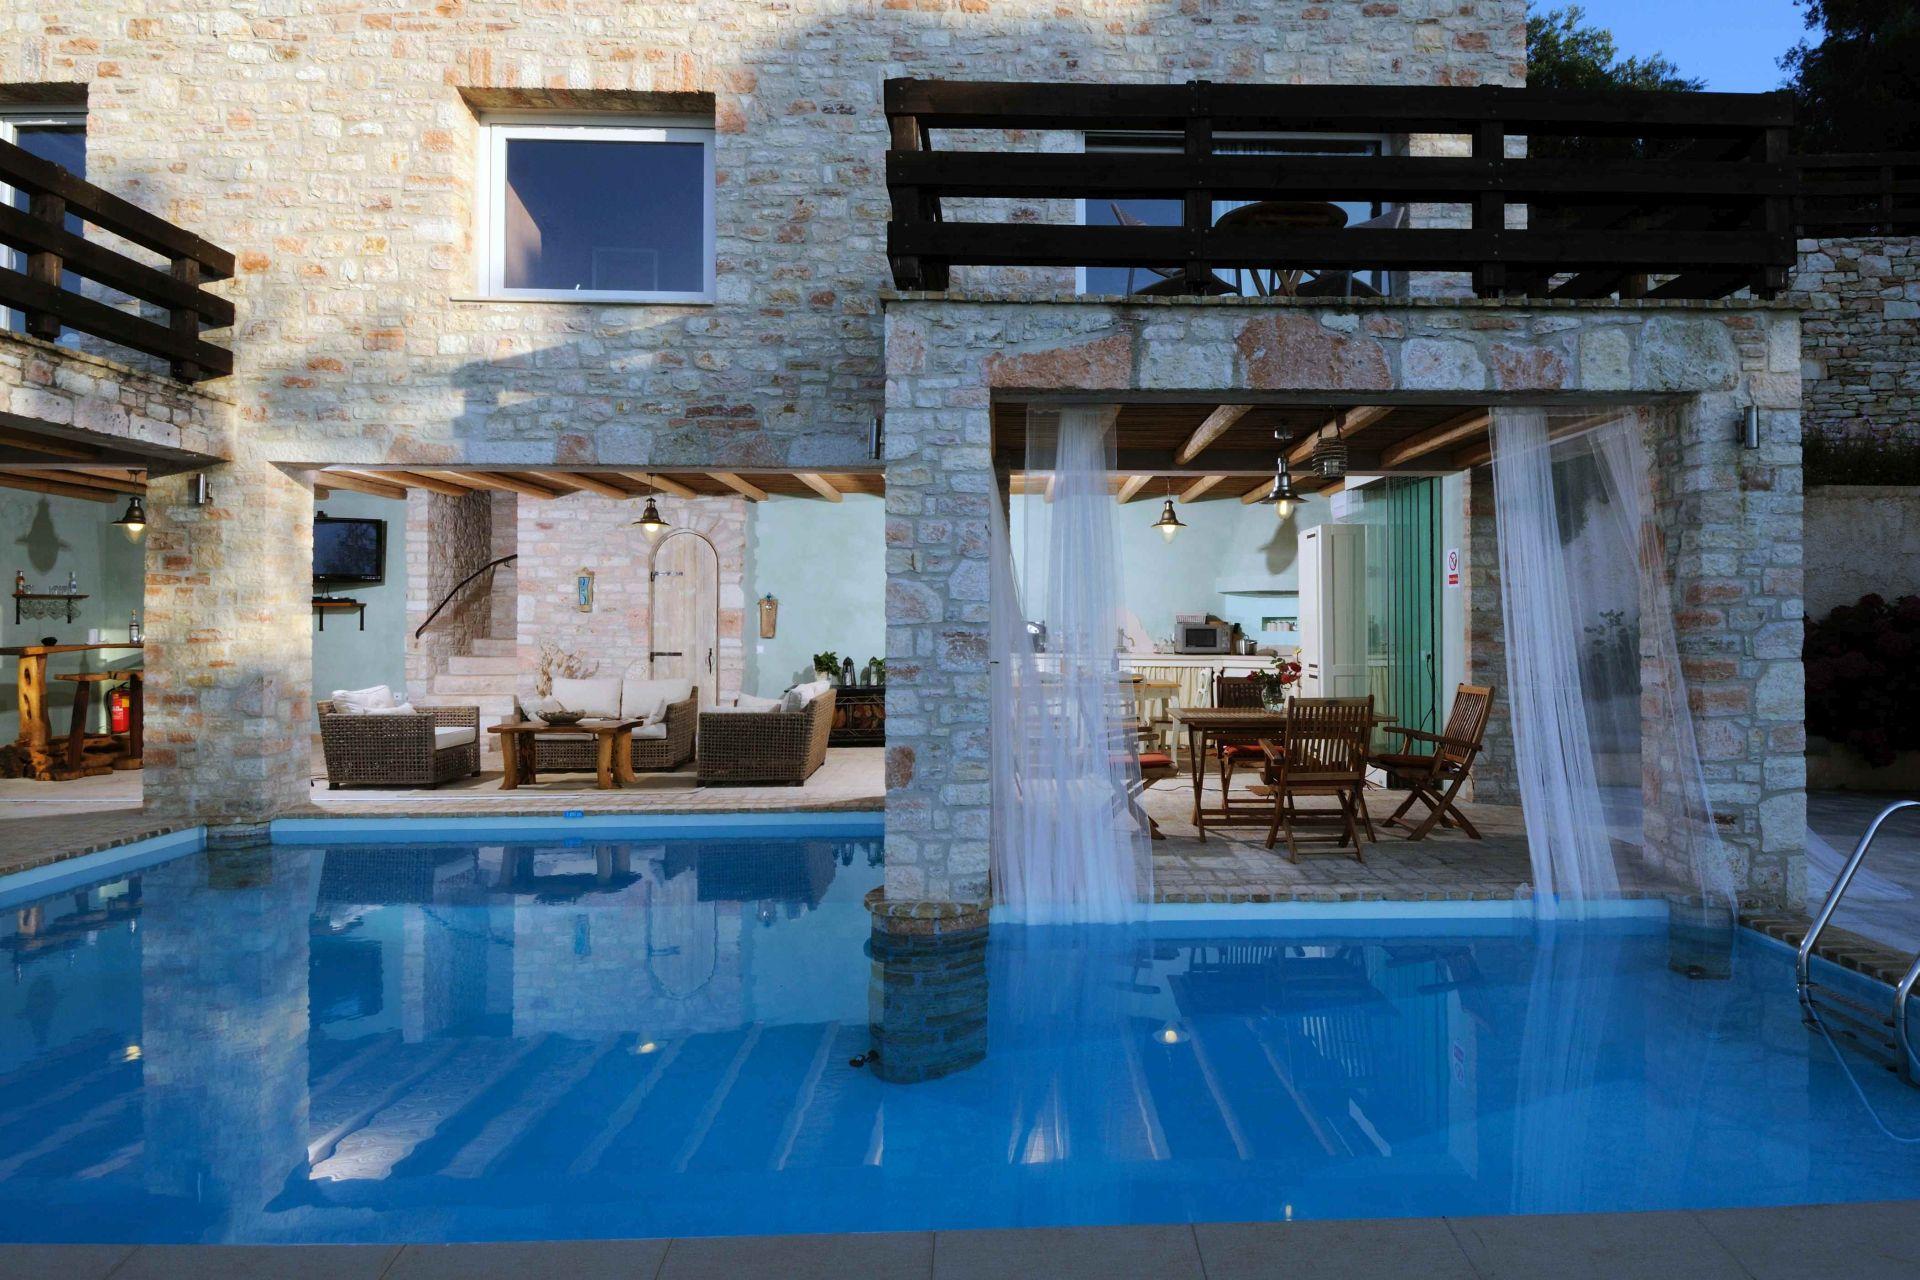 Rückfront - Korfu Villa Steilküste, Agios Spiridon, Korfu, Griechenland